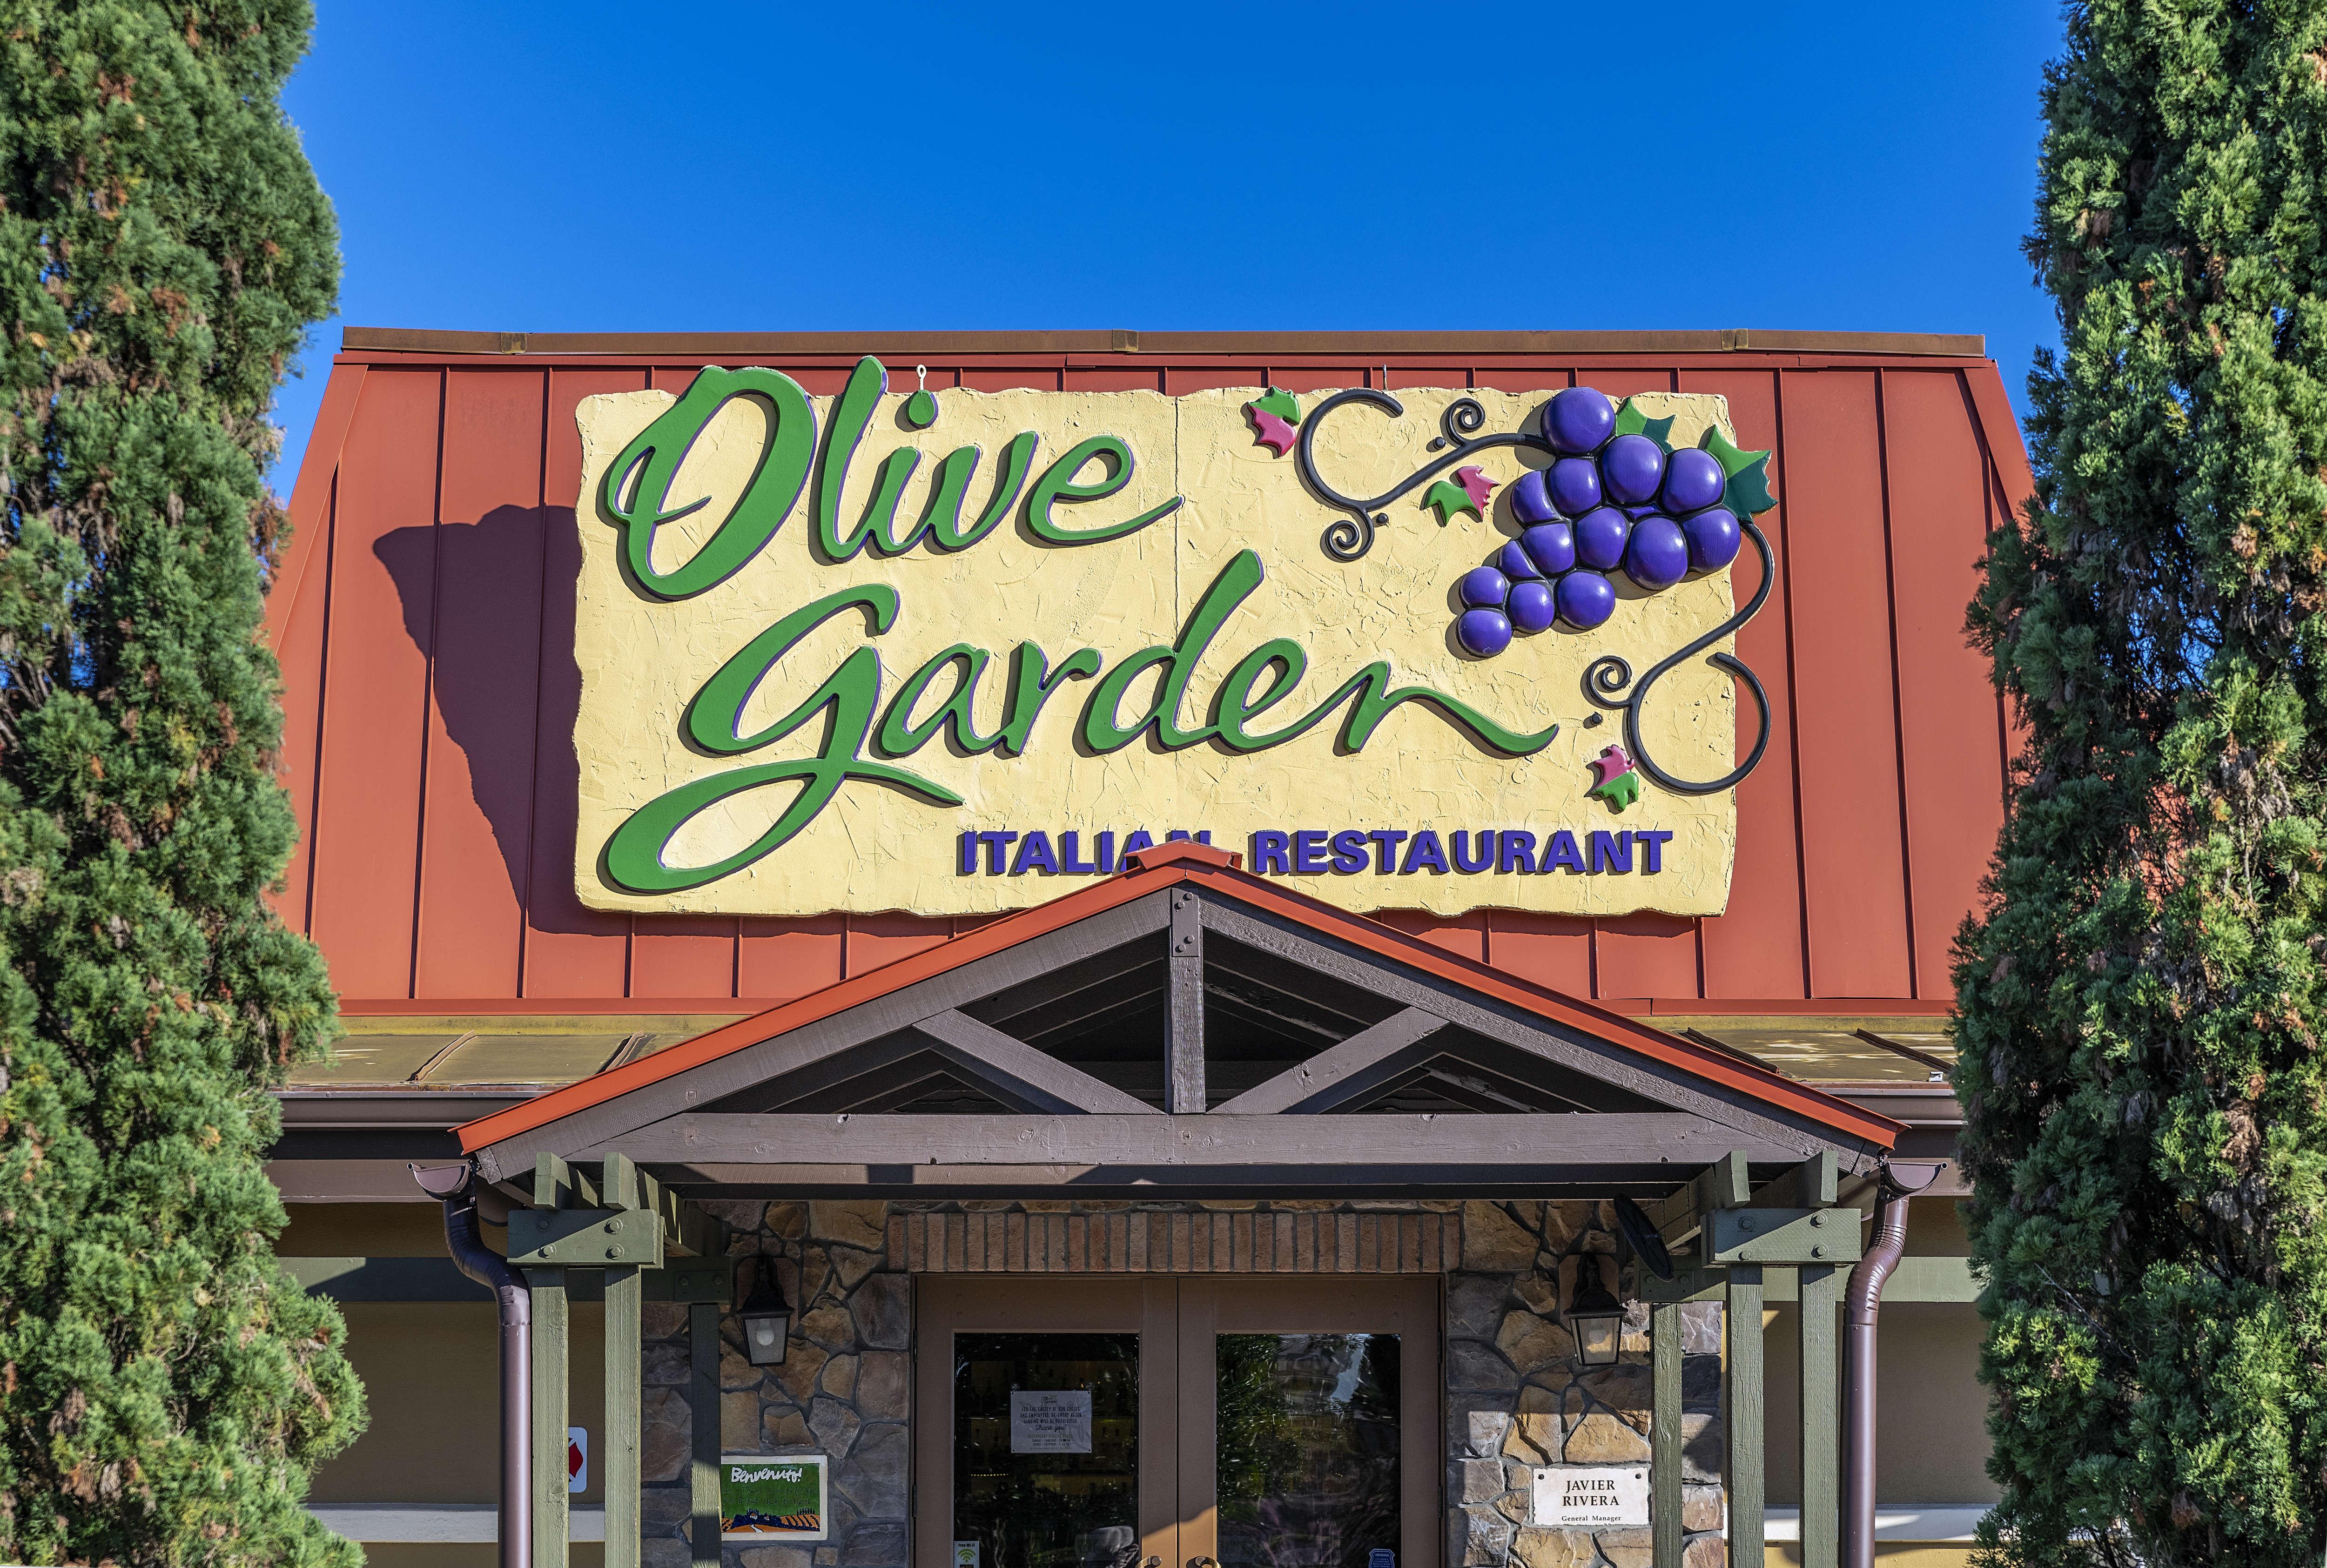 The exterior of an Olive Garden restaurant.